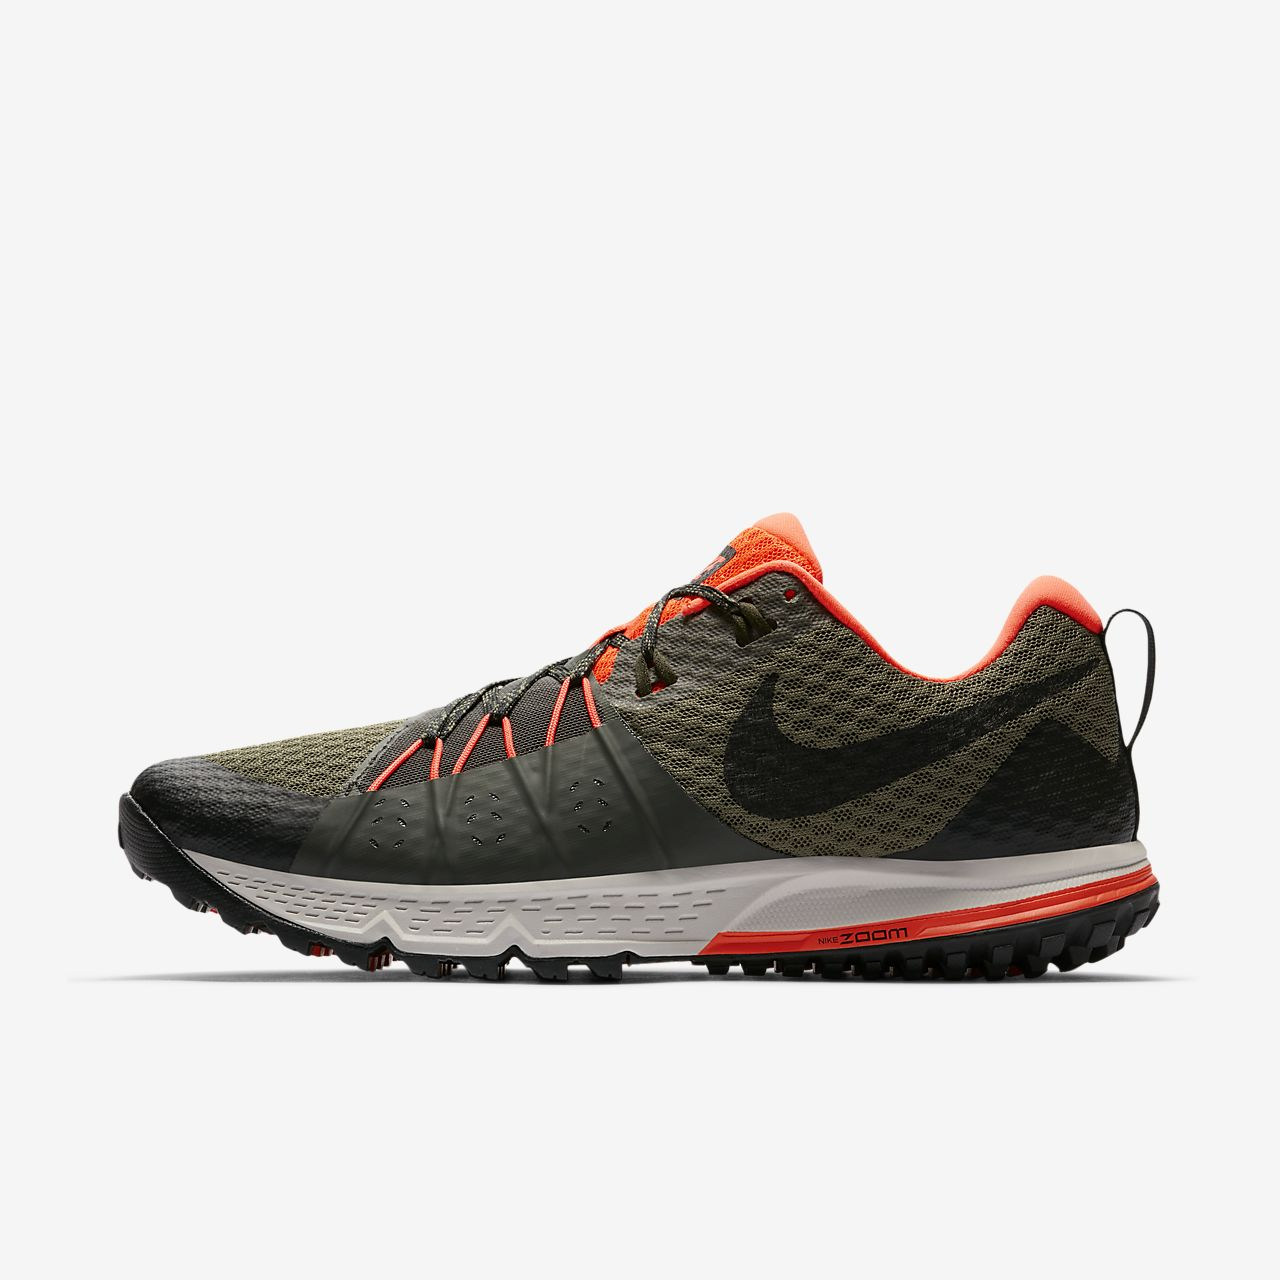 ... Chaussure de running Nike Air Zoom Wildhorse 4 pour Homme